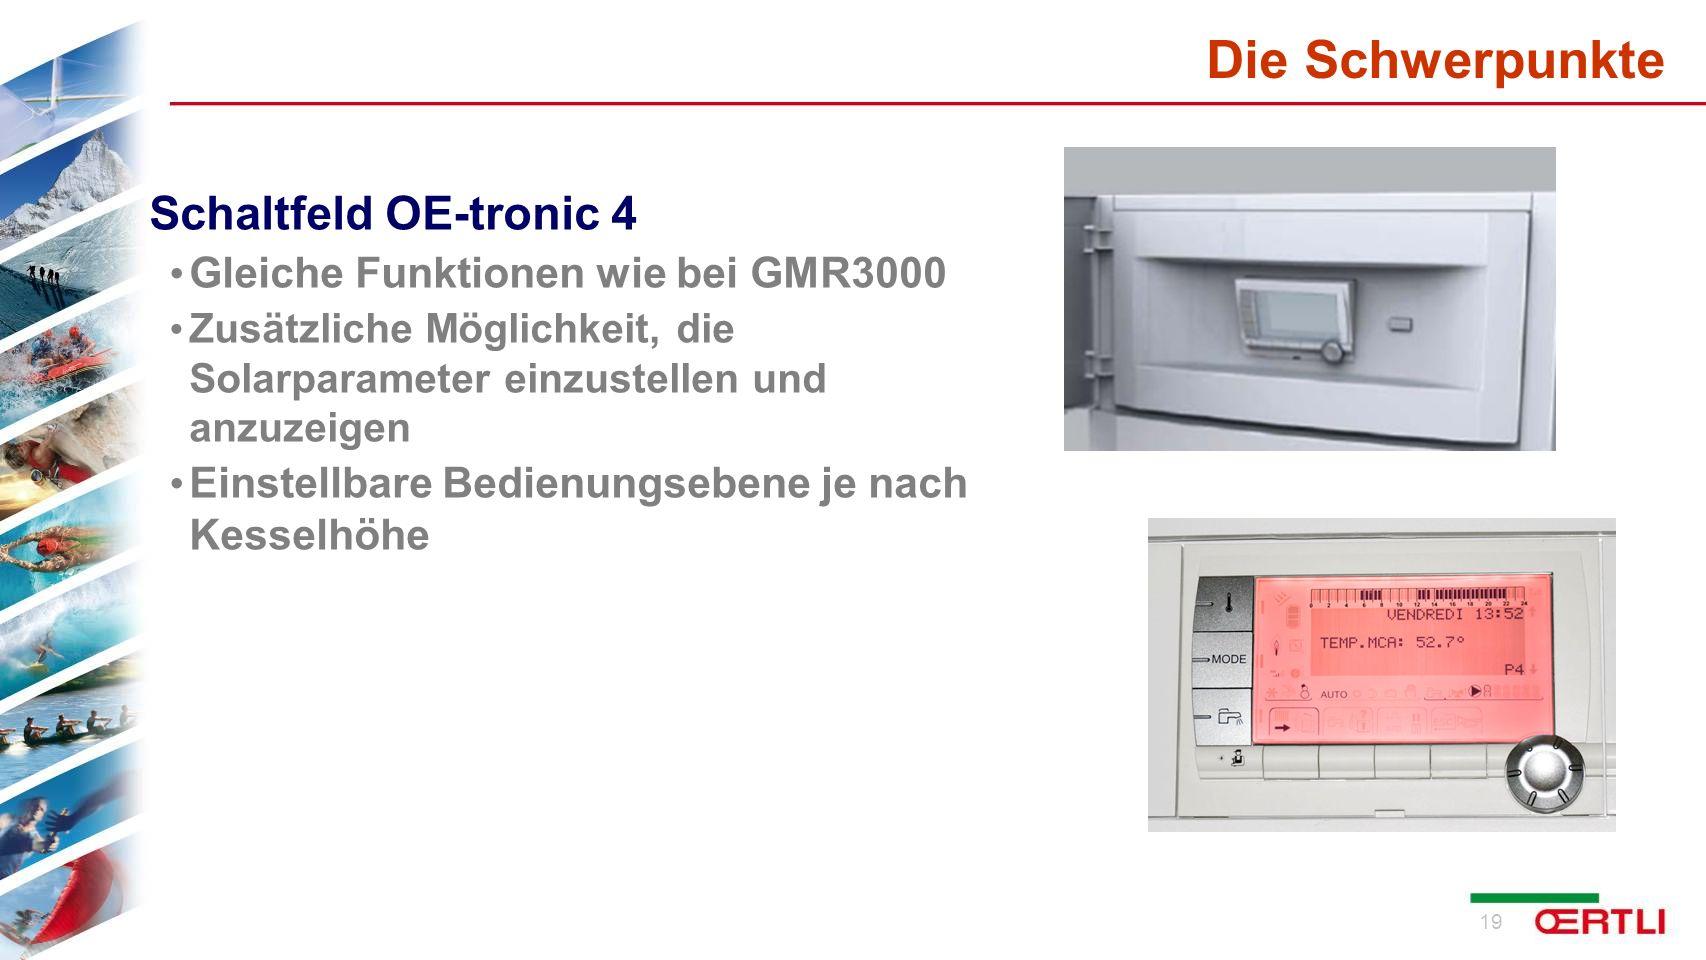 Die Schwerpunkte Schaltfeld OE-tronic 4